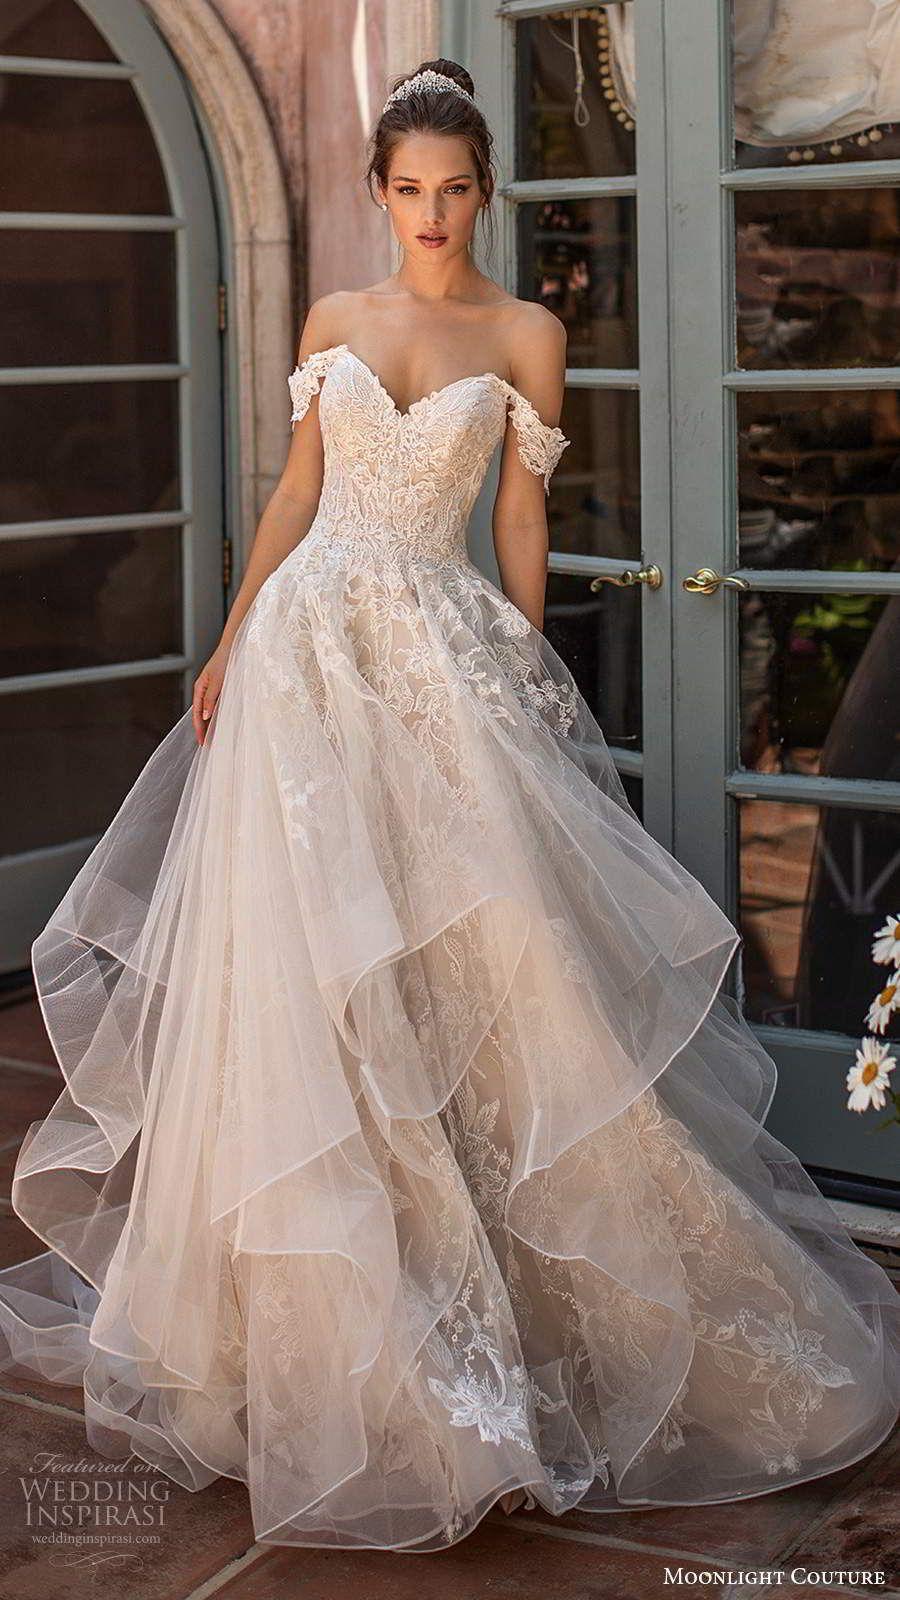 Moonlight Couture Spring 2020 Wedding Dresses | Wedding Inspirasi